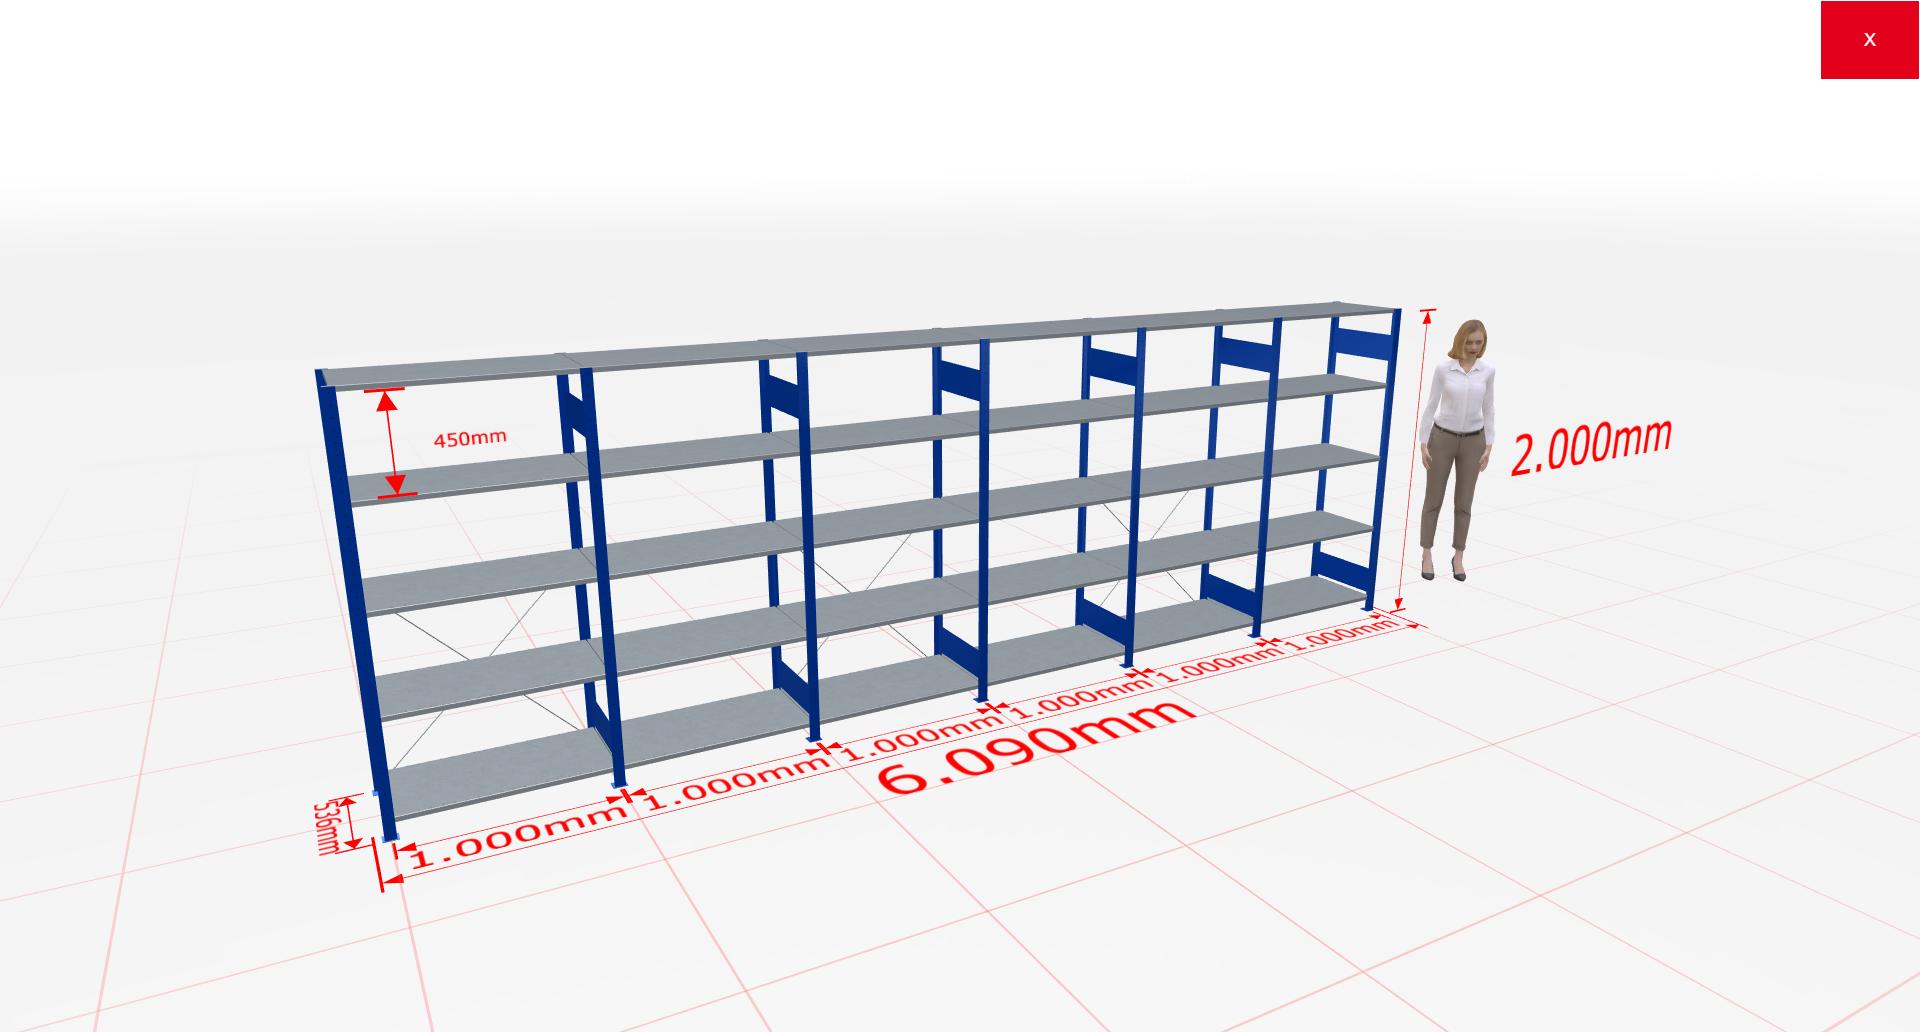 Fachbodenregal Komplettregal 2000x6090x500 mm (HxBxT) SCHULTE Lagertechnik blau 5 Ebenen  150 kg je Boden